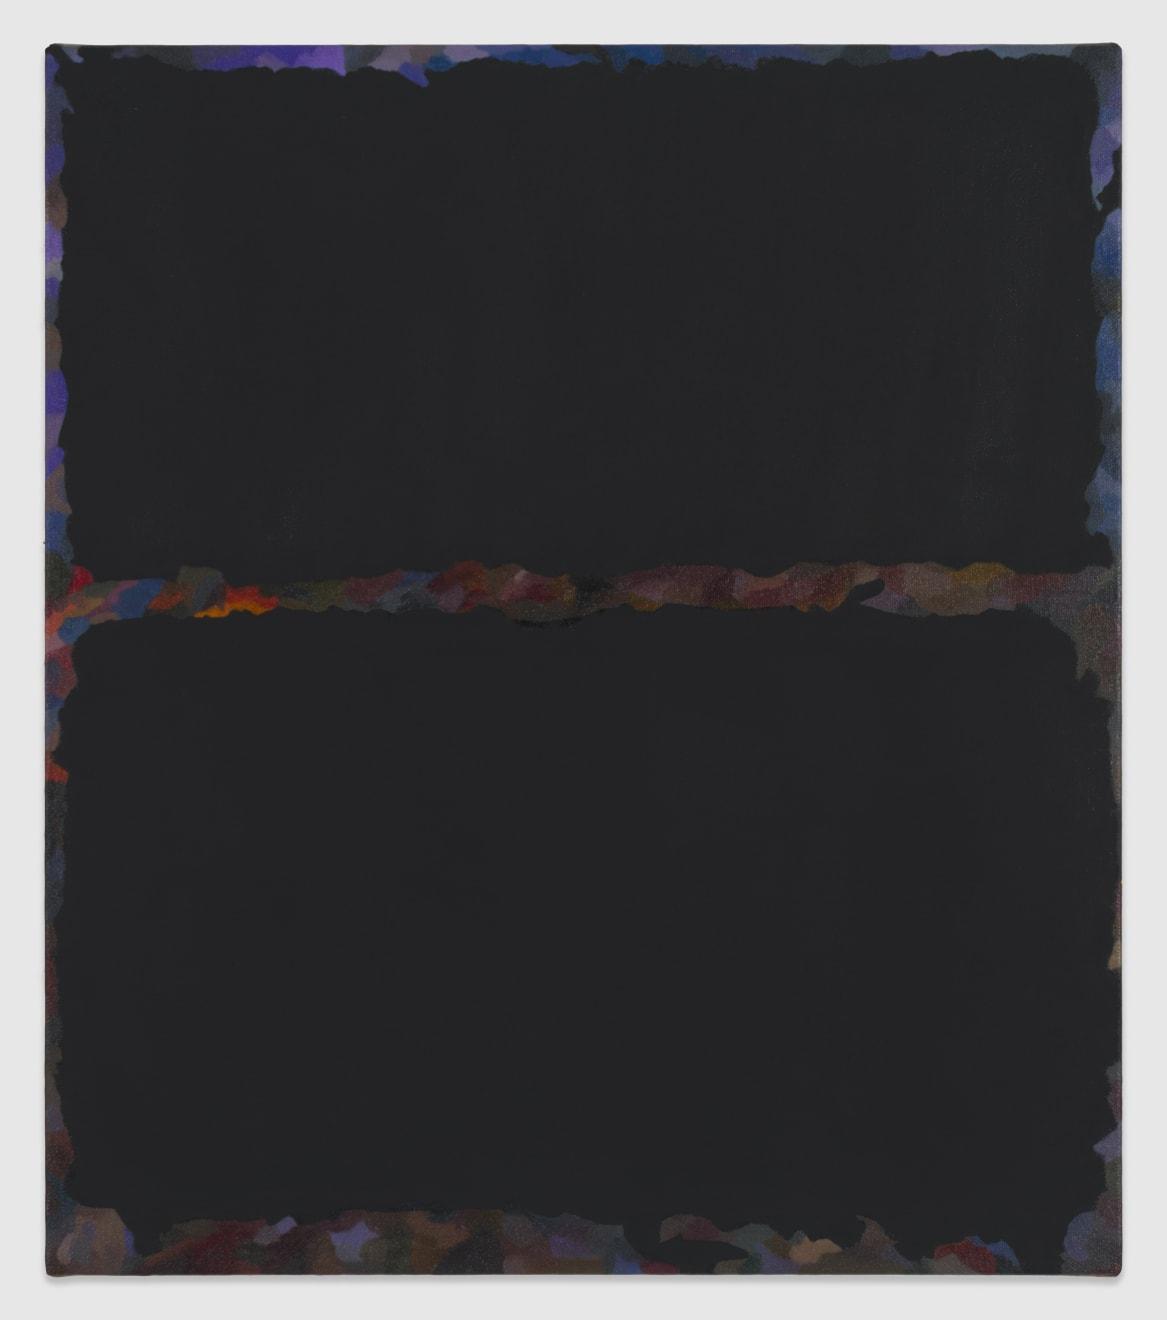 Rob Ventura, Dark Matter IX, 2015